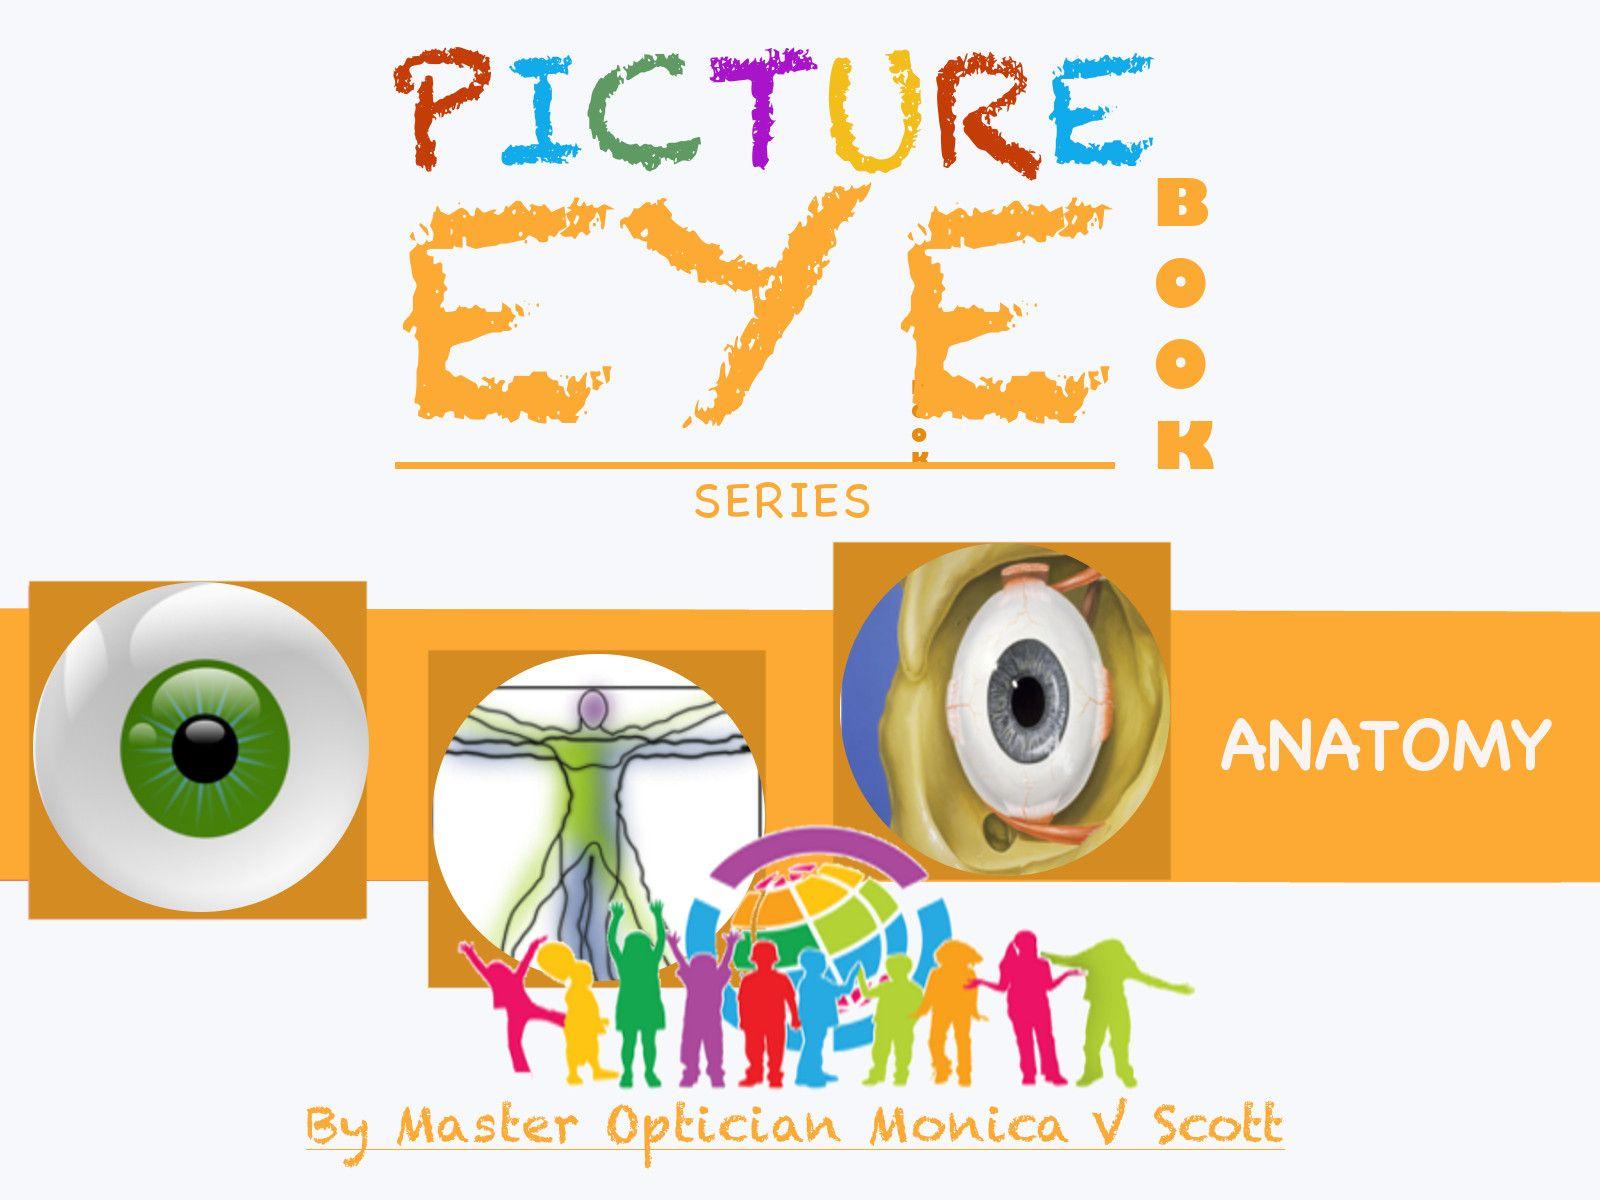 Kids eye anatomy e-book by an optician on amazon.com | Write ...